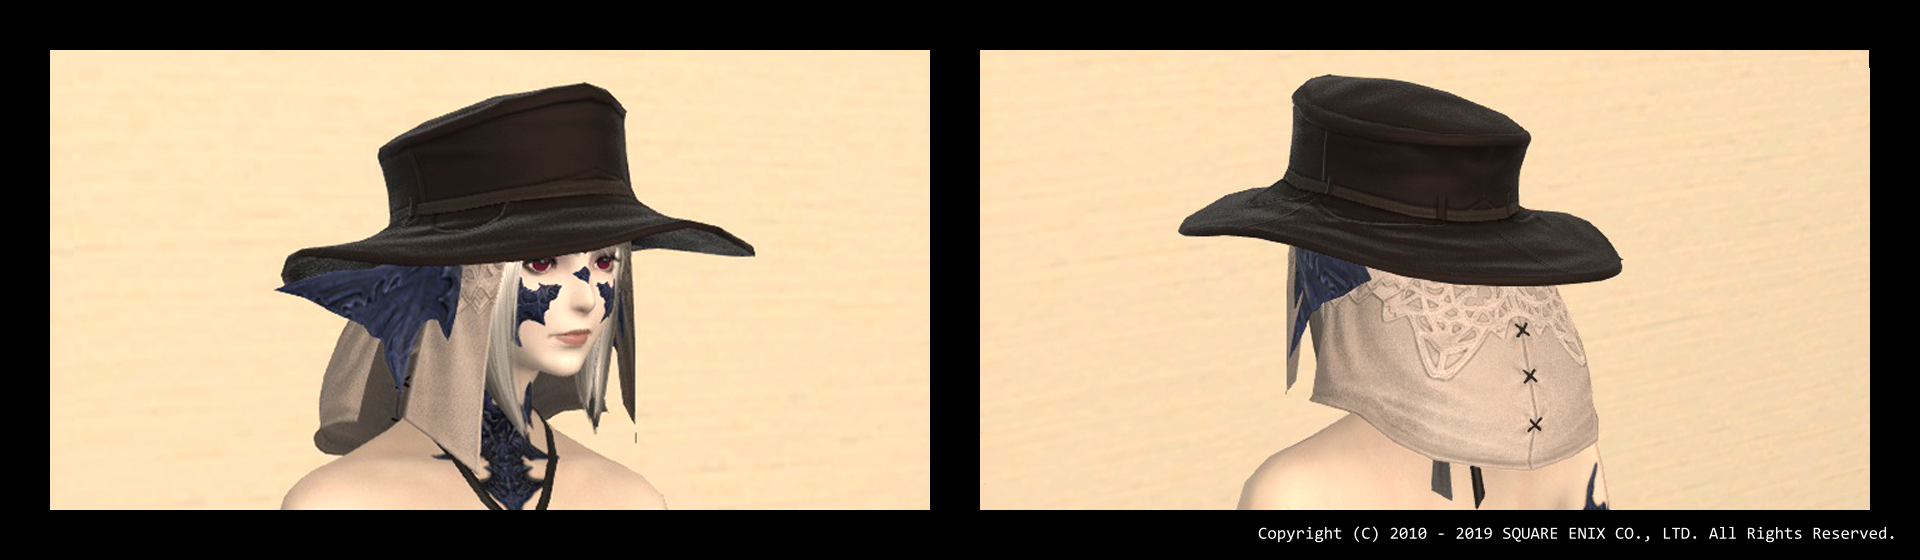 400-blmsmnrdmblu-head